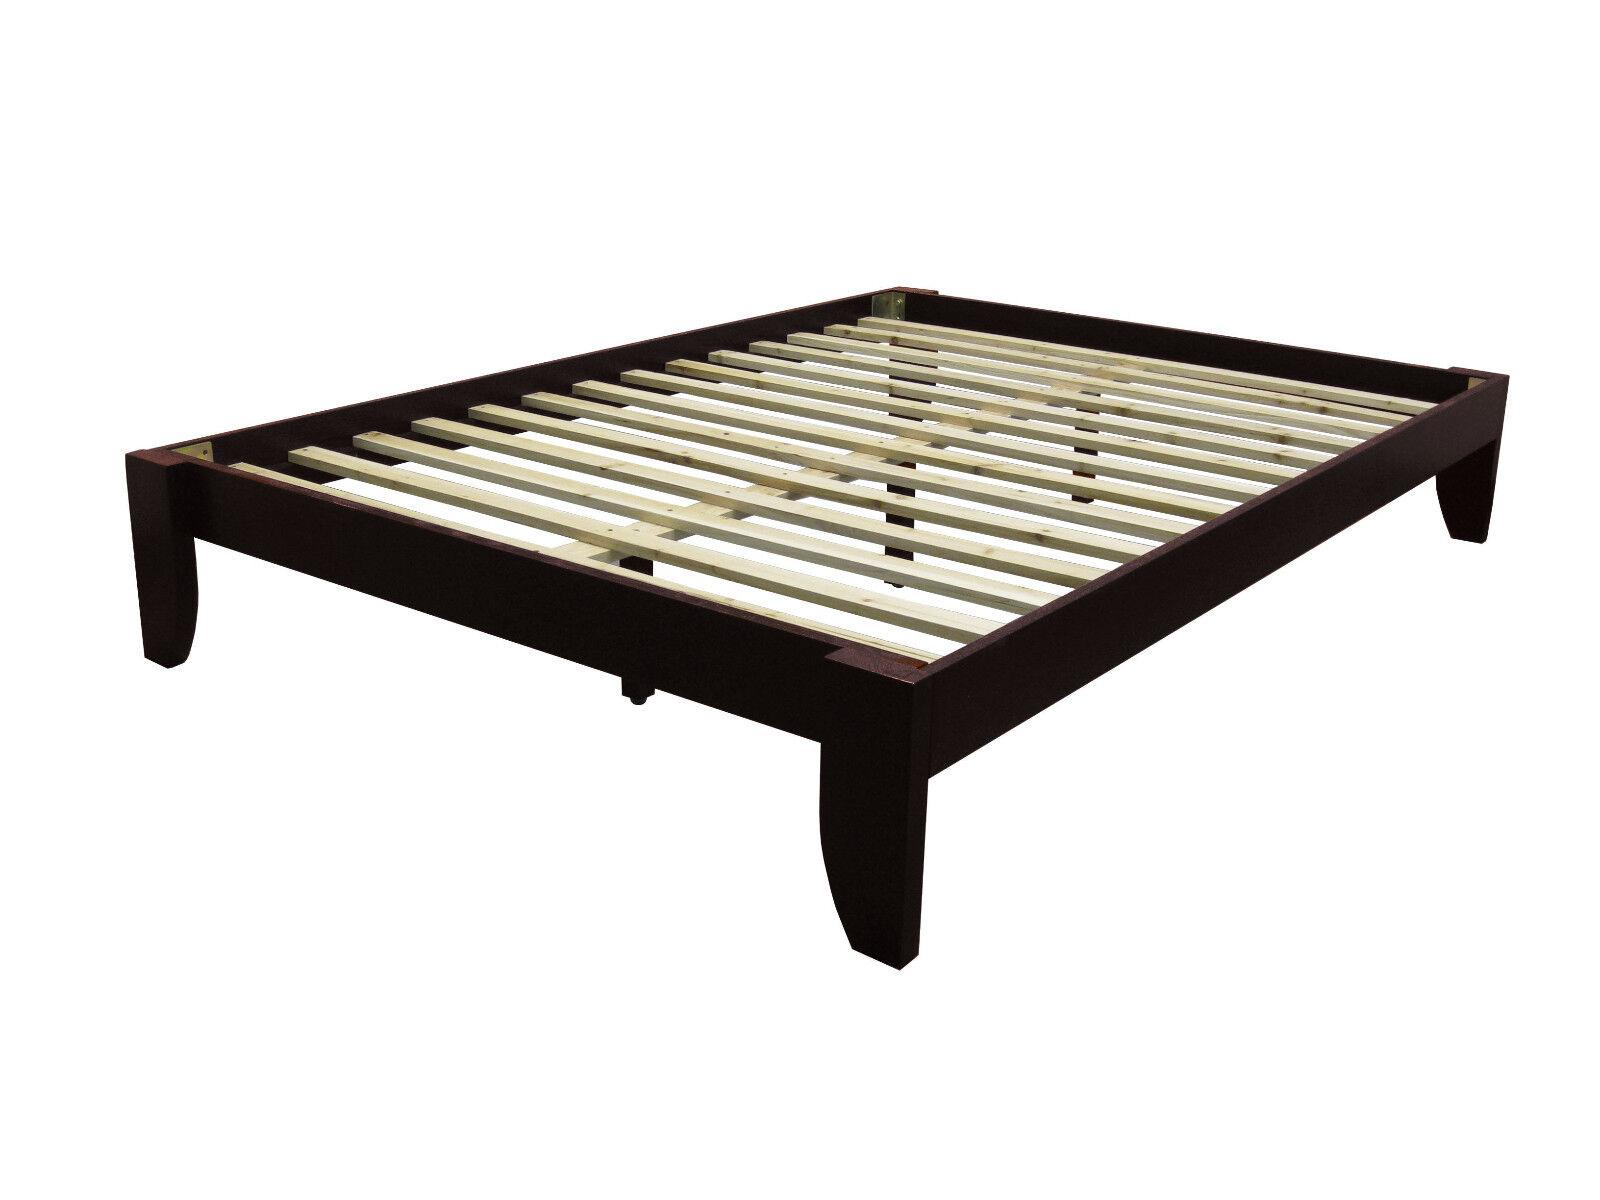 KING Solid Bamboo All Wood Platform Bed Frame Choose Finish!